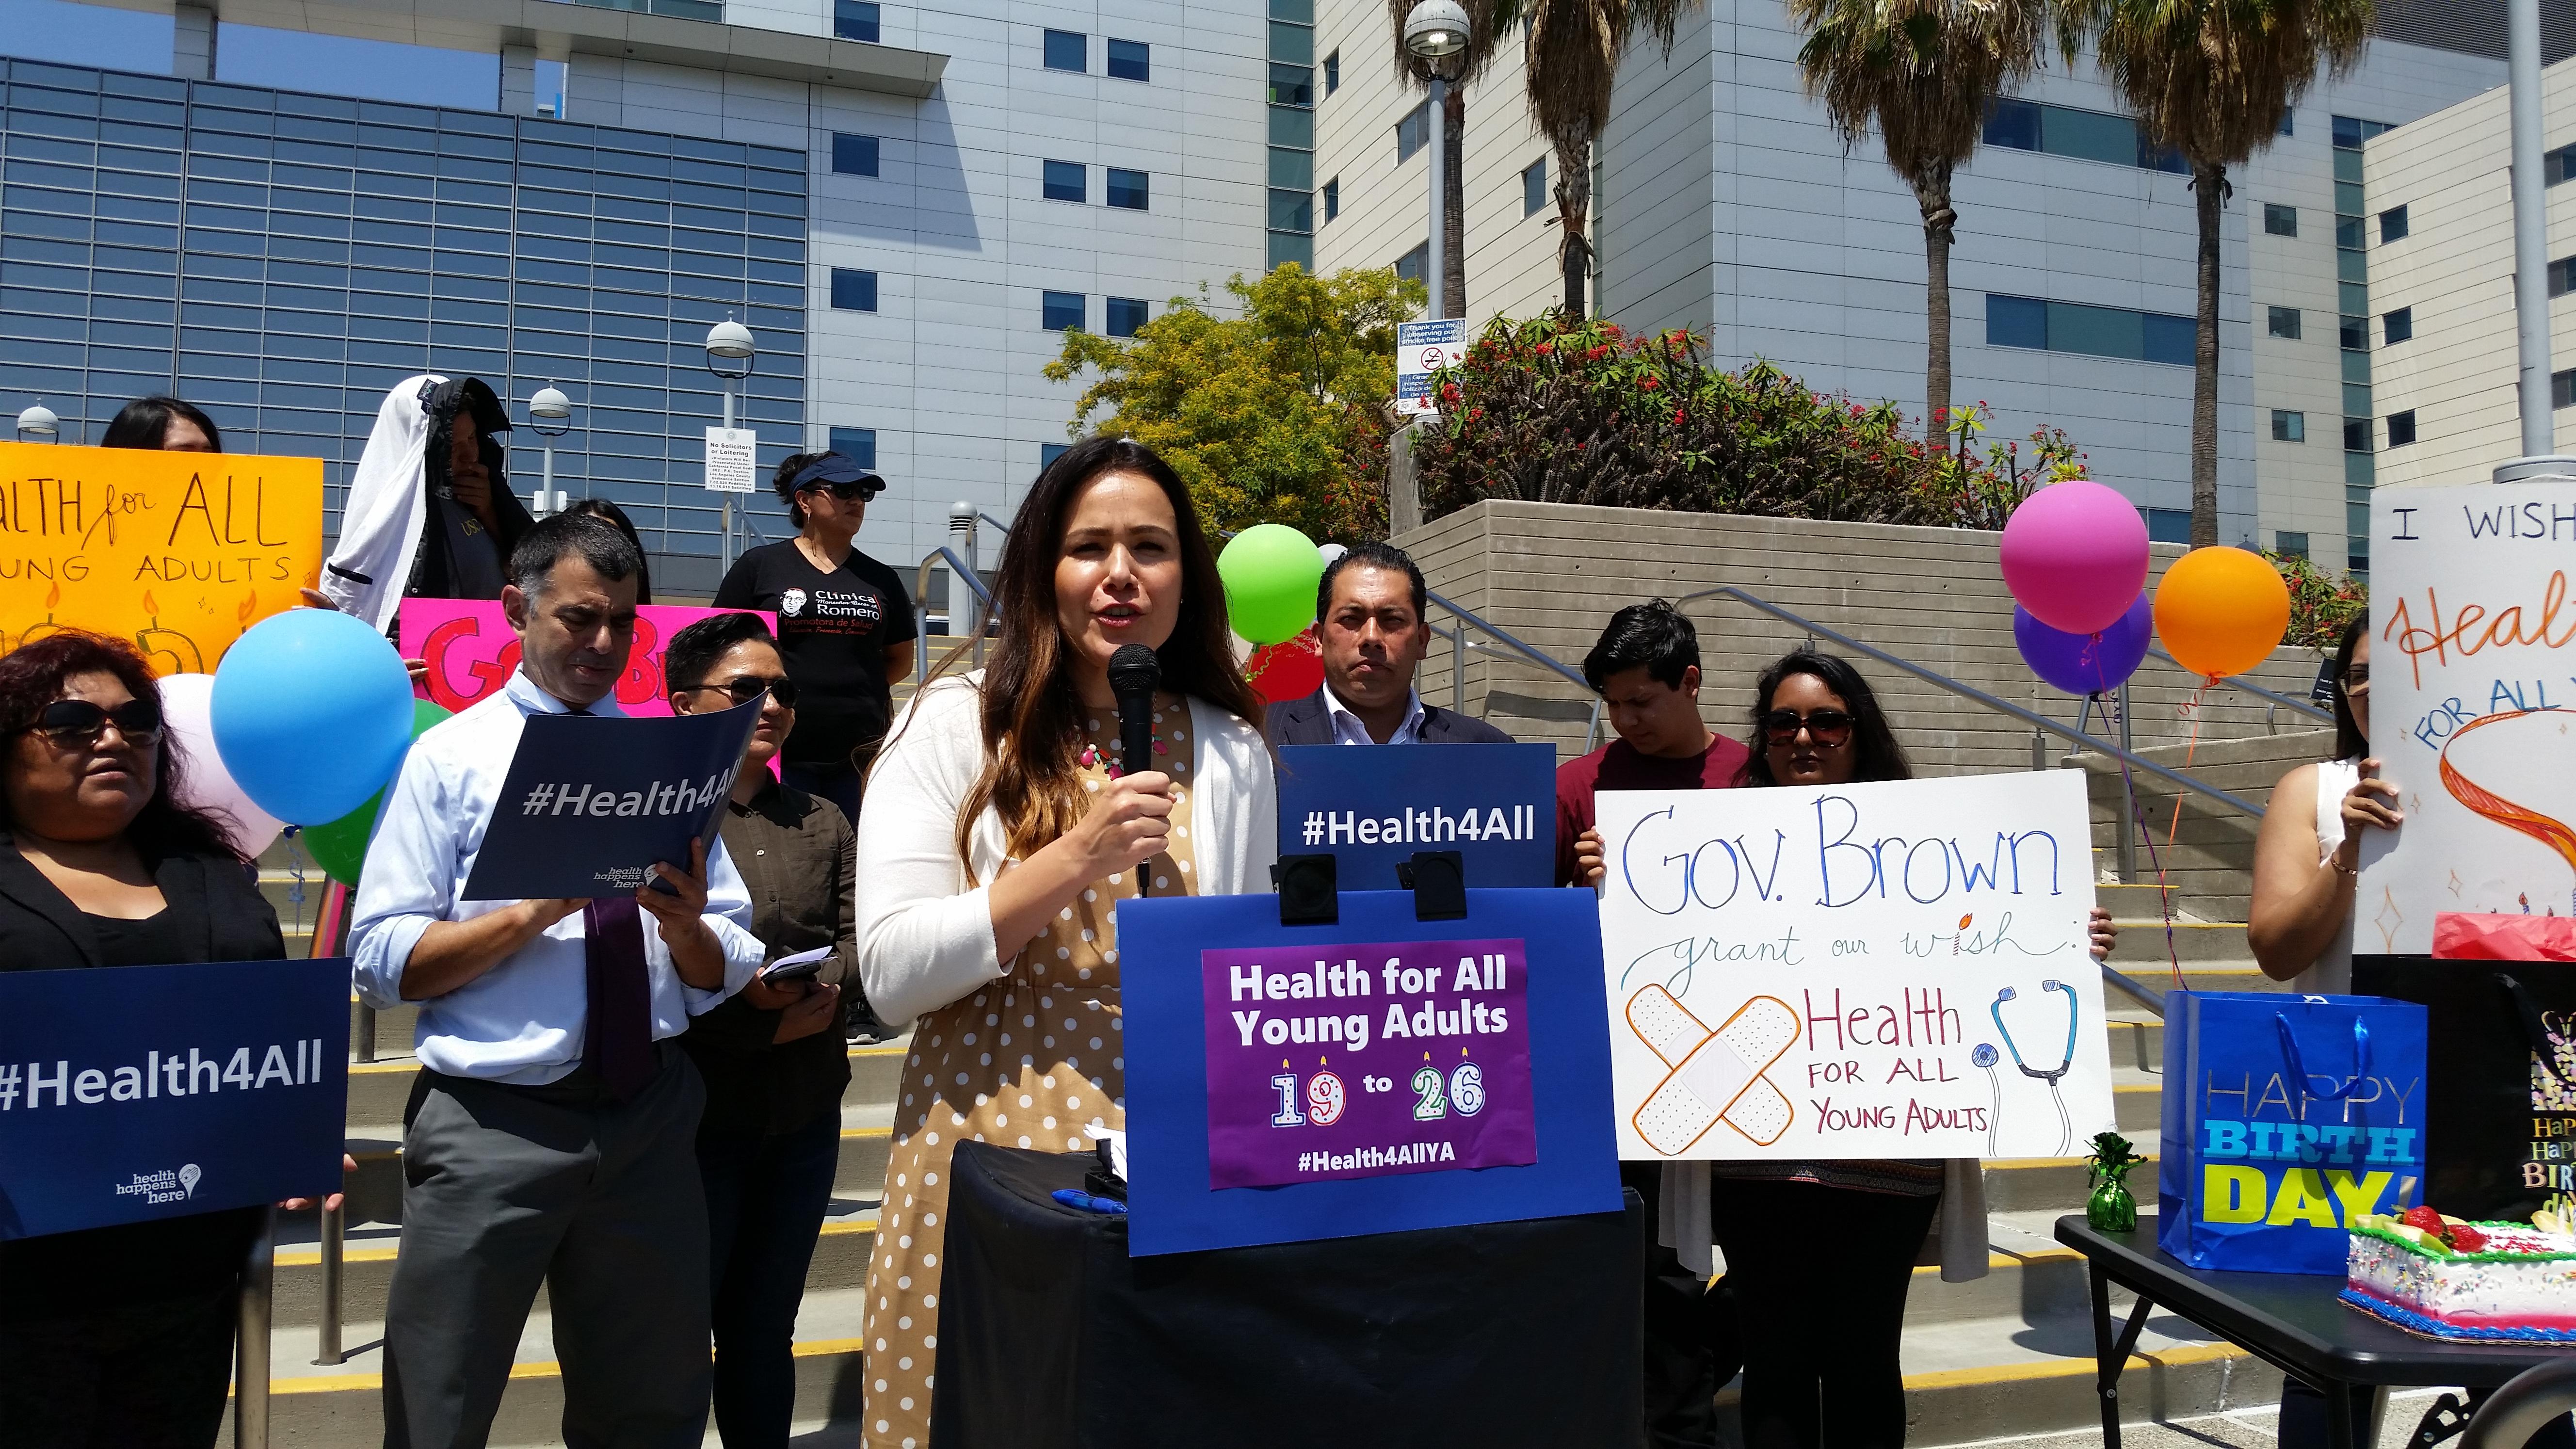 Mayra Álvarez, Presidenta de The Children Partnership, frente hospital general de Los Ángeles.